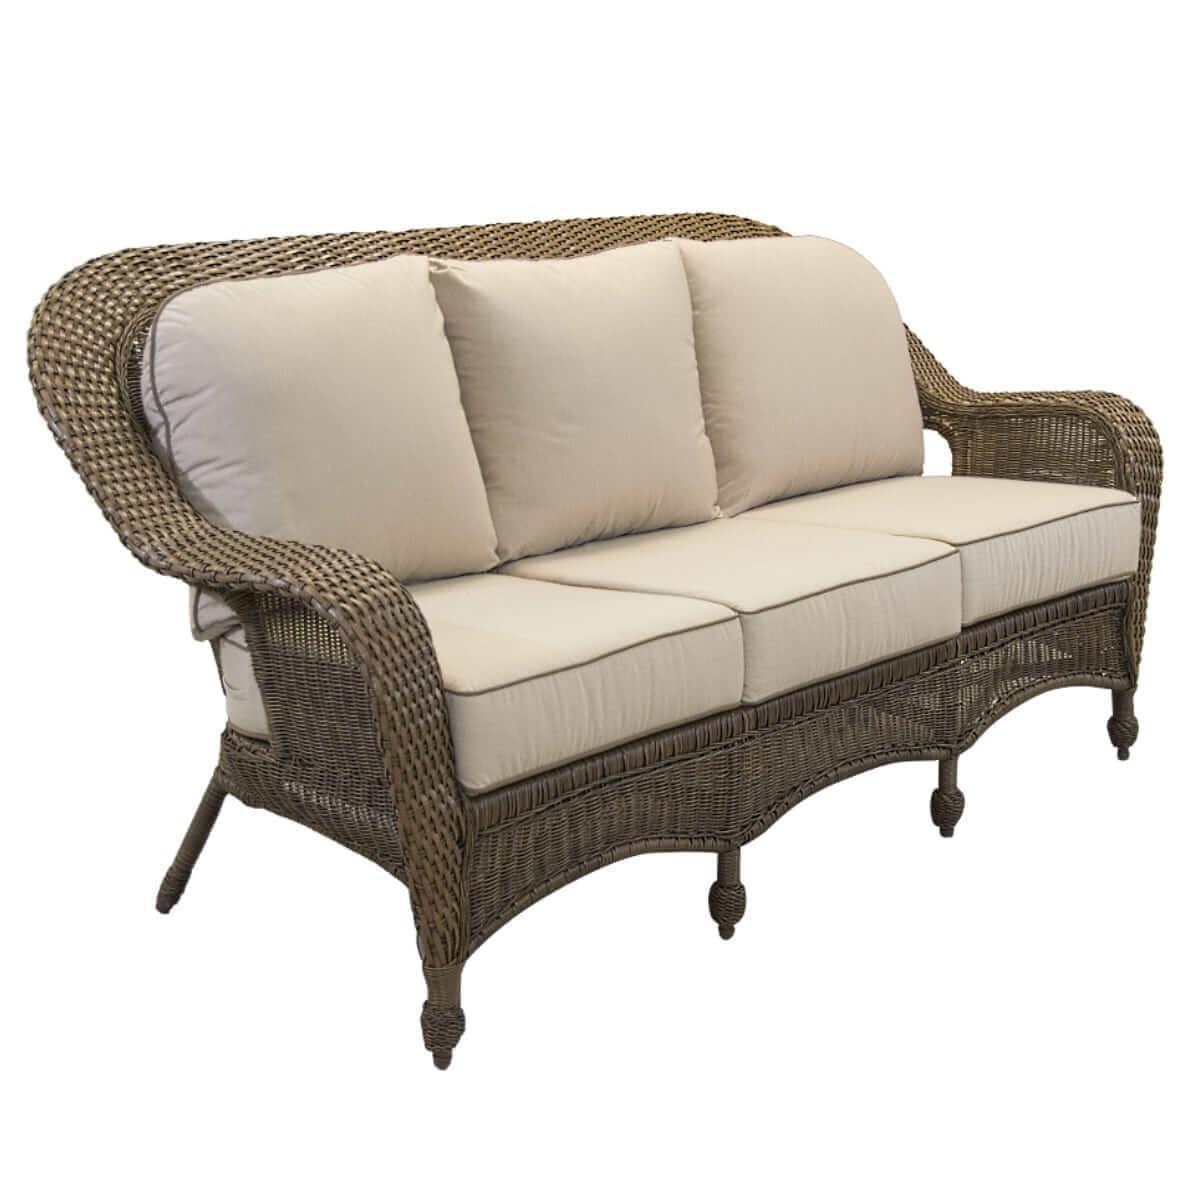 Winward Outdoor Patio Furniture 3 Seater Sofa Patiohq